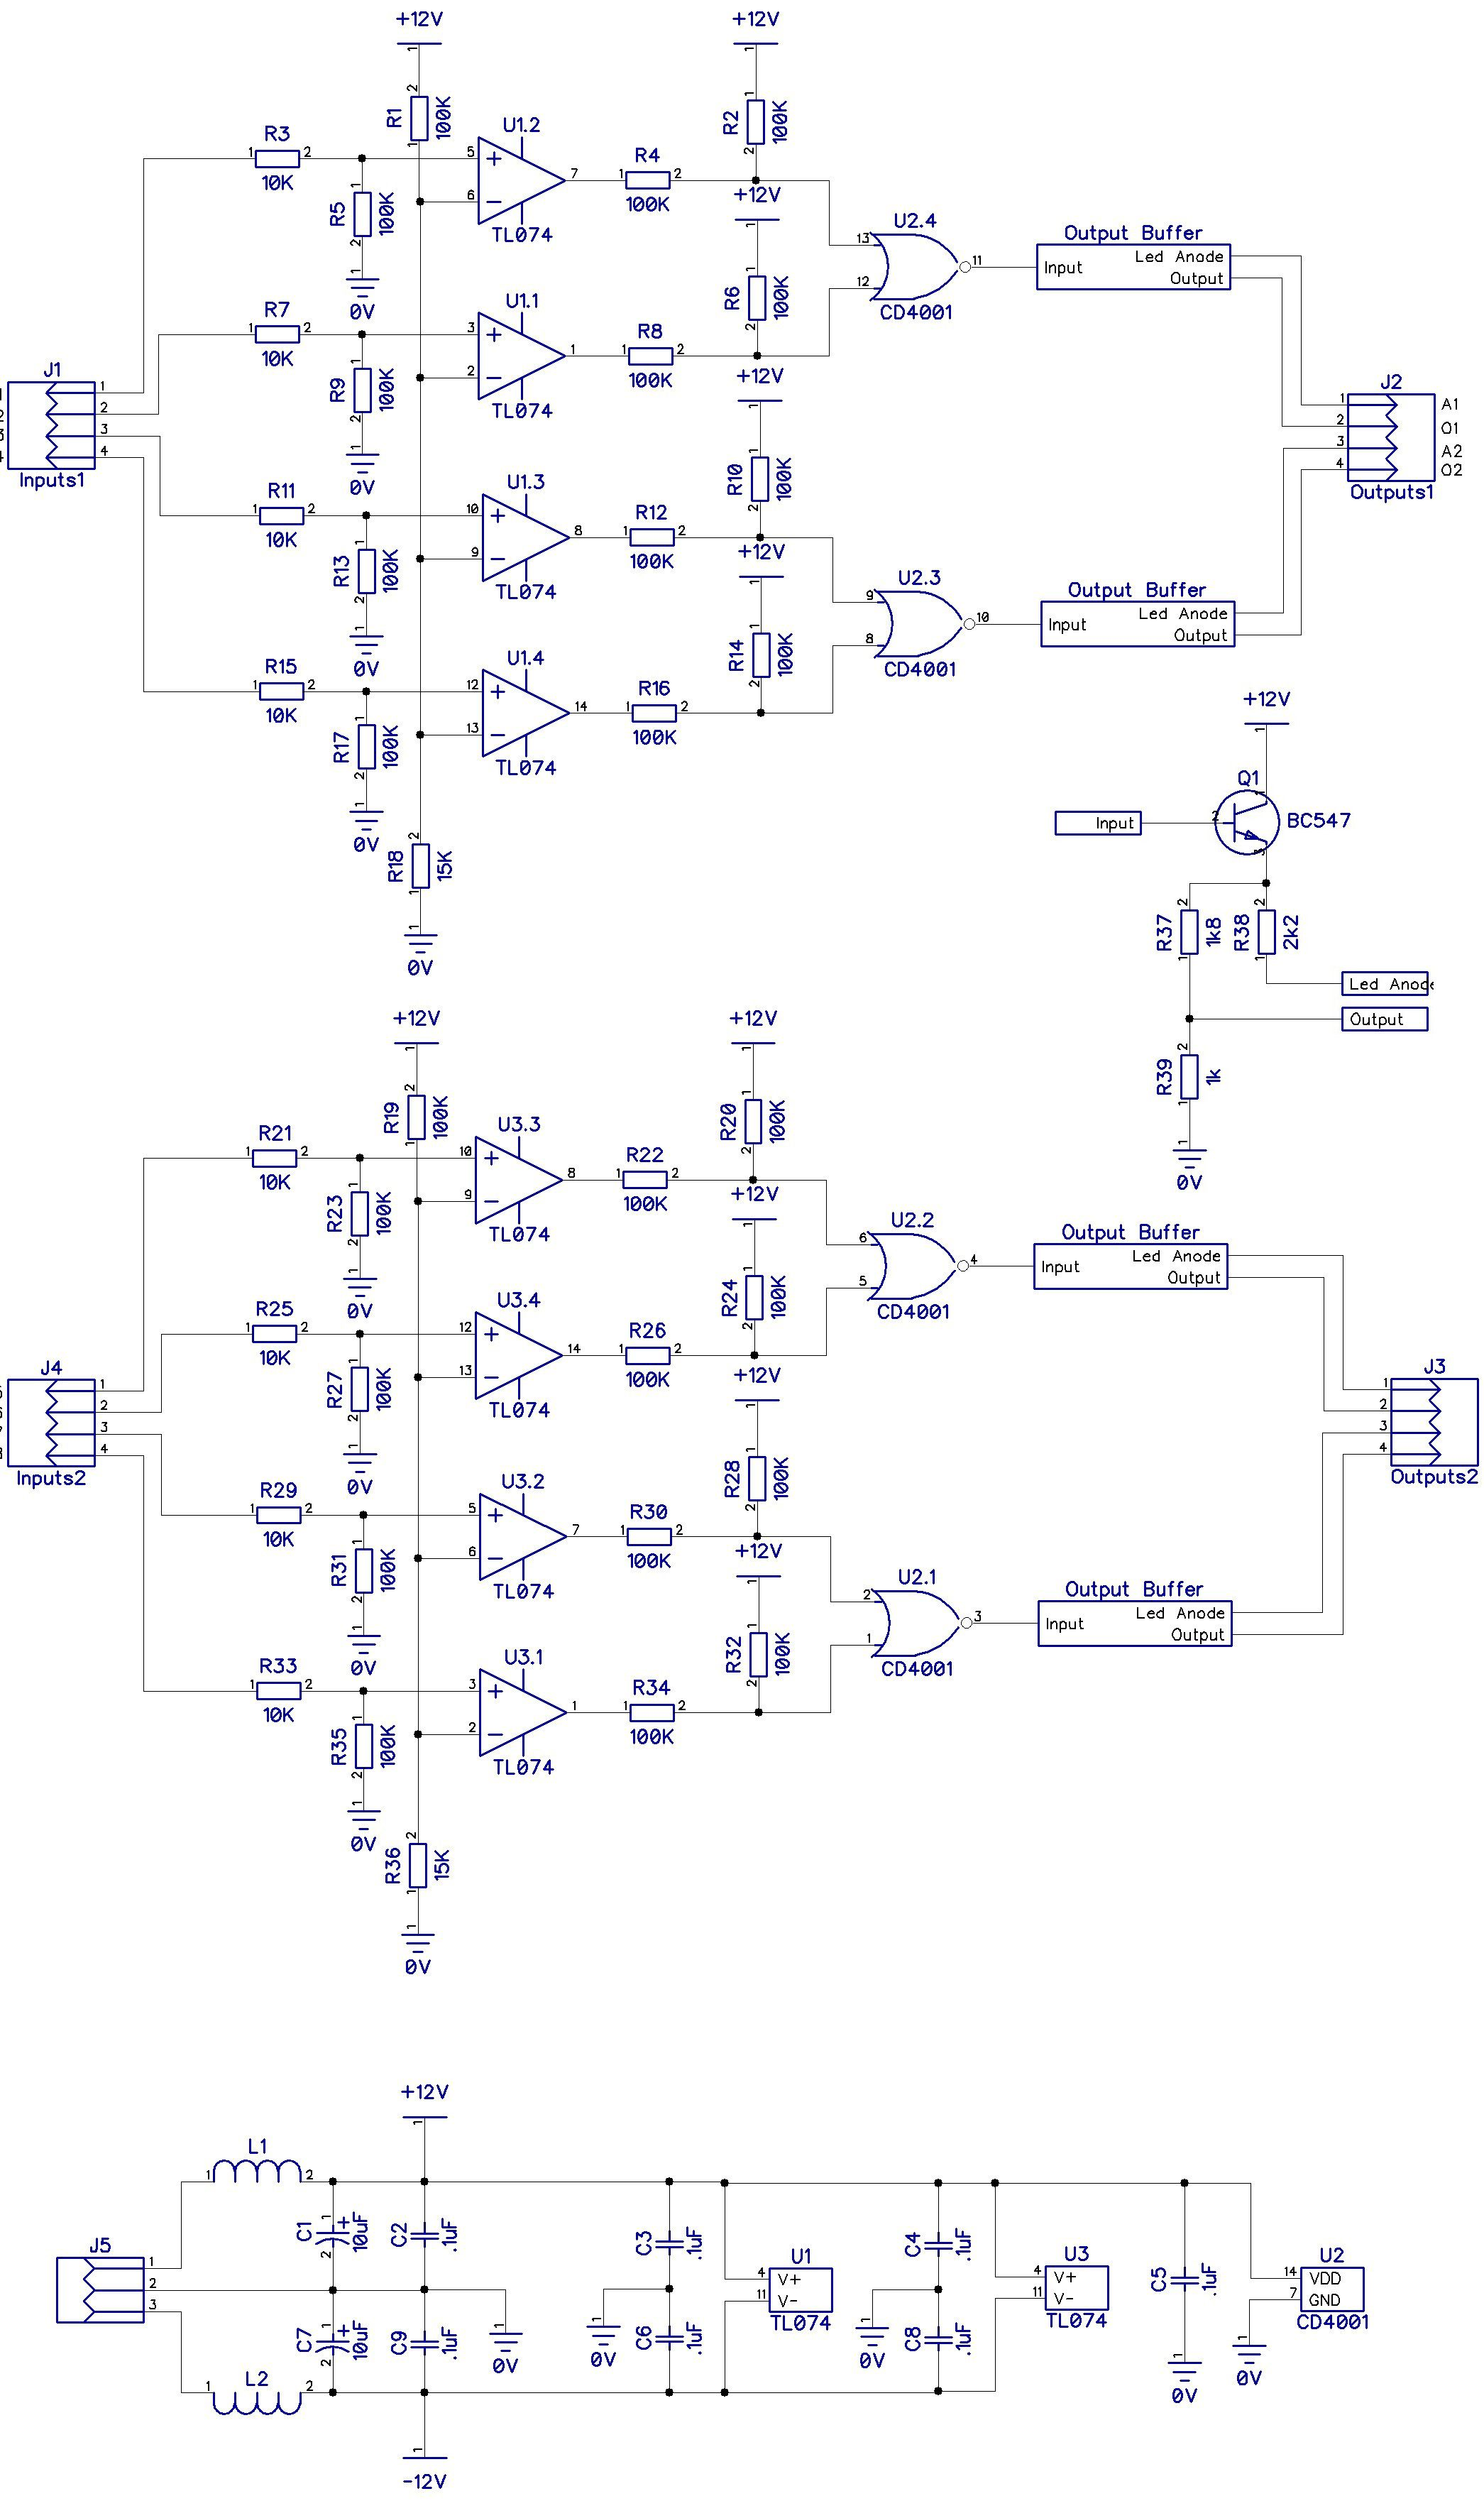 Quad And Gate Schematic Circuit Wiring Diagram Hub Xor Ken Stone Logic Gates Schematics Cgs39 All About Modular Rh Pinterest Ca